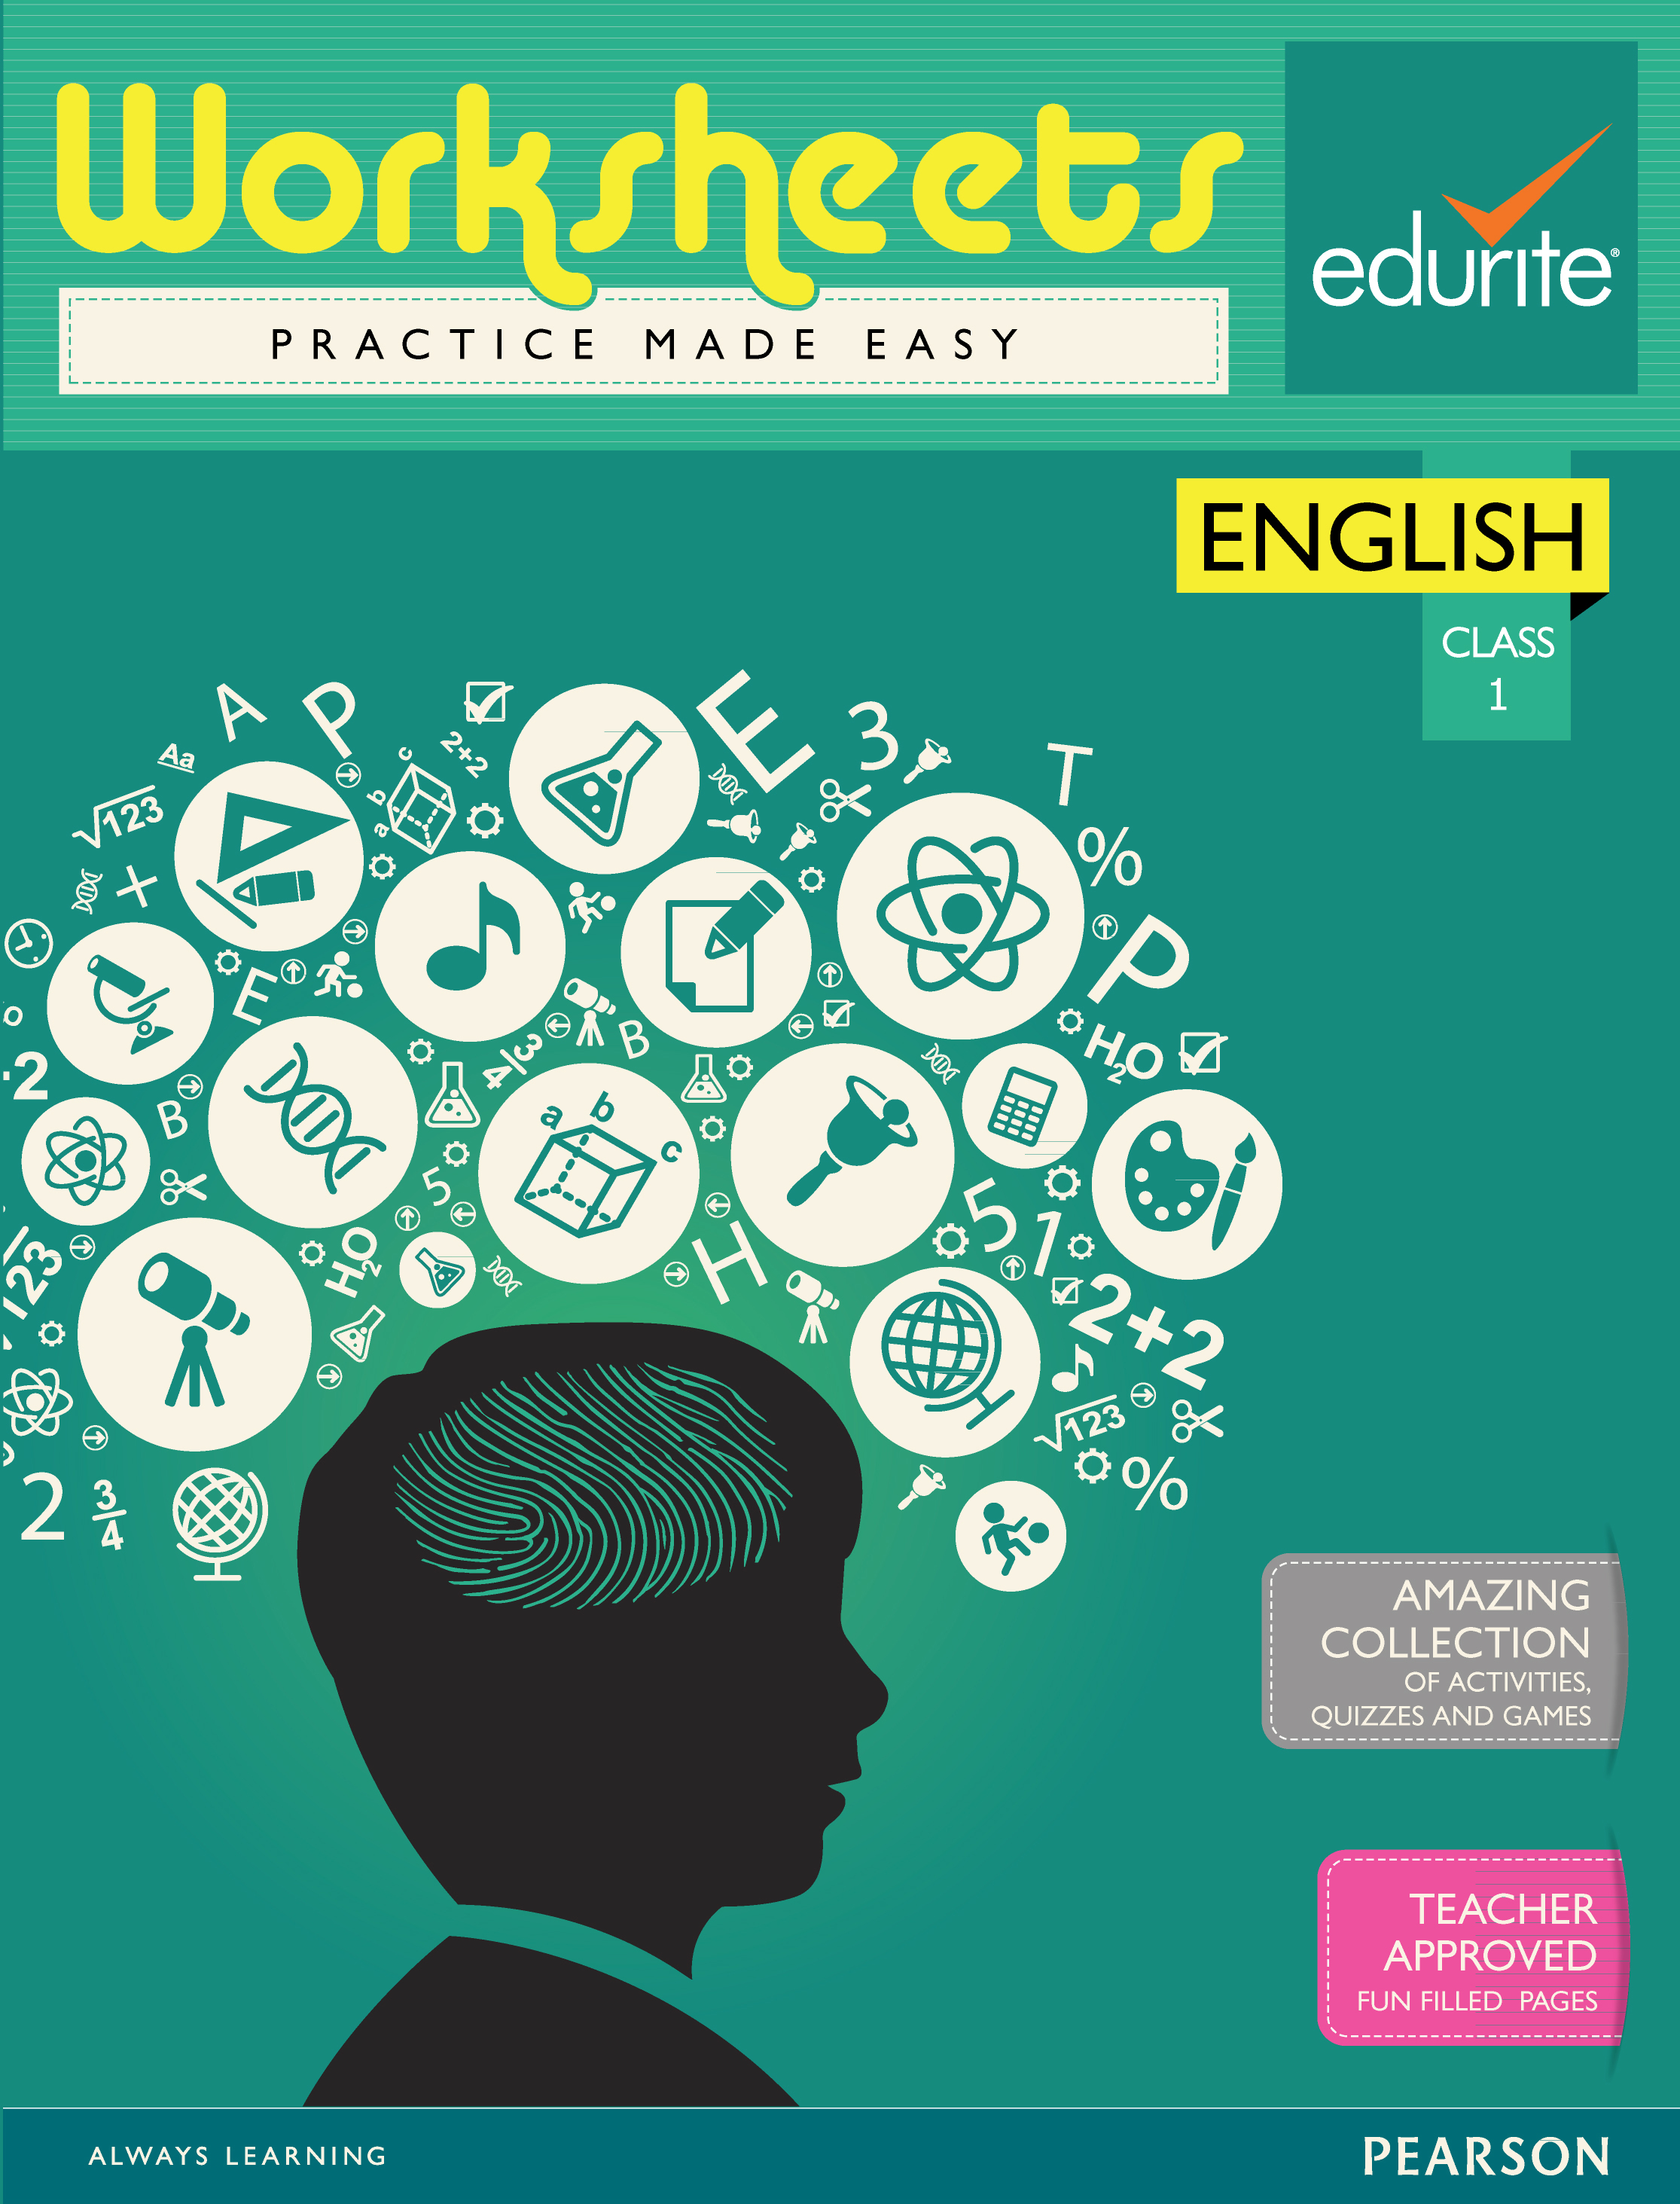 Buy Edurite Class 1 English Worksheets book : Edurite, 6666000579 ...